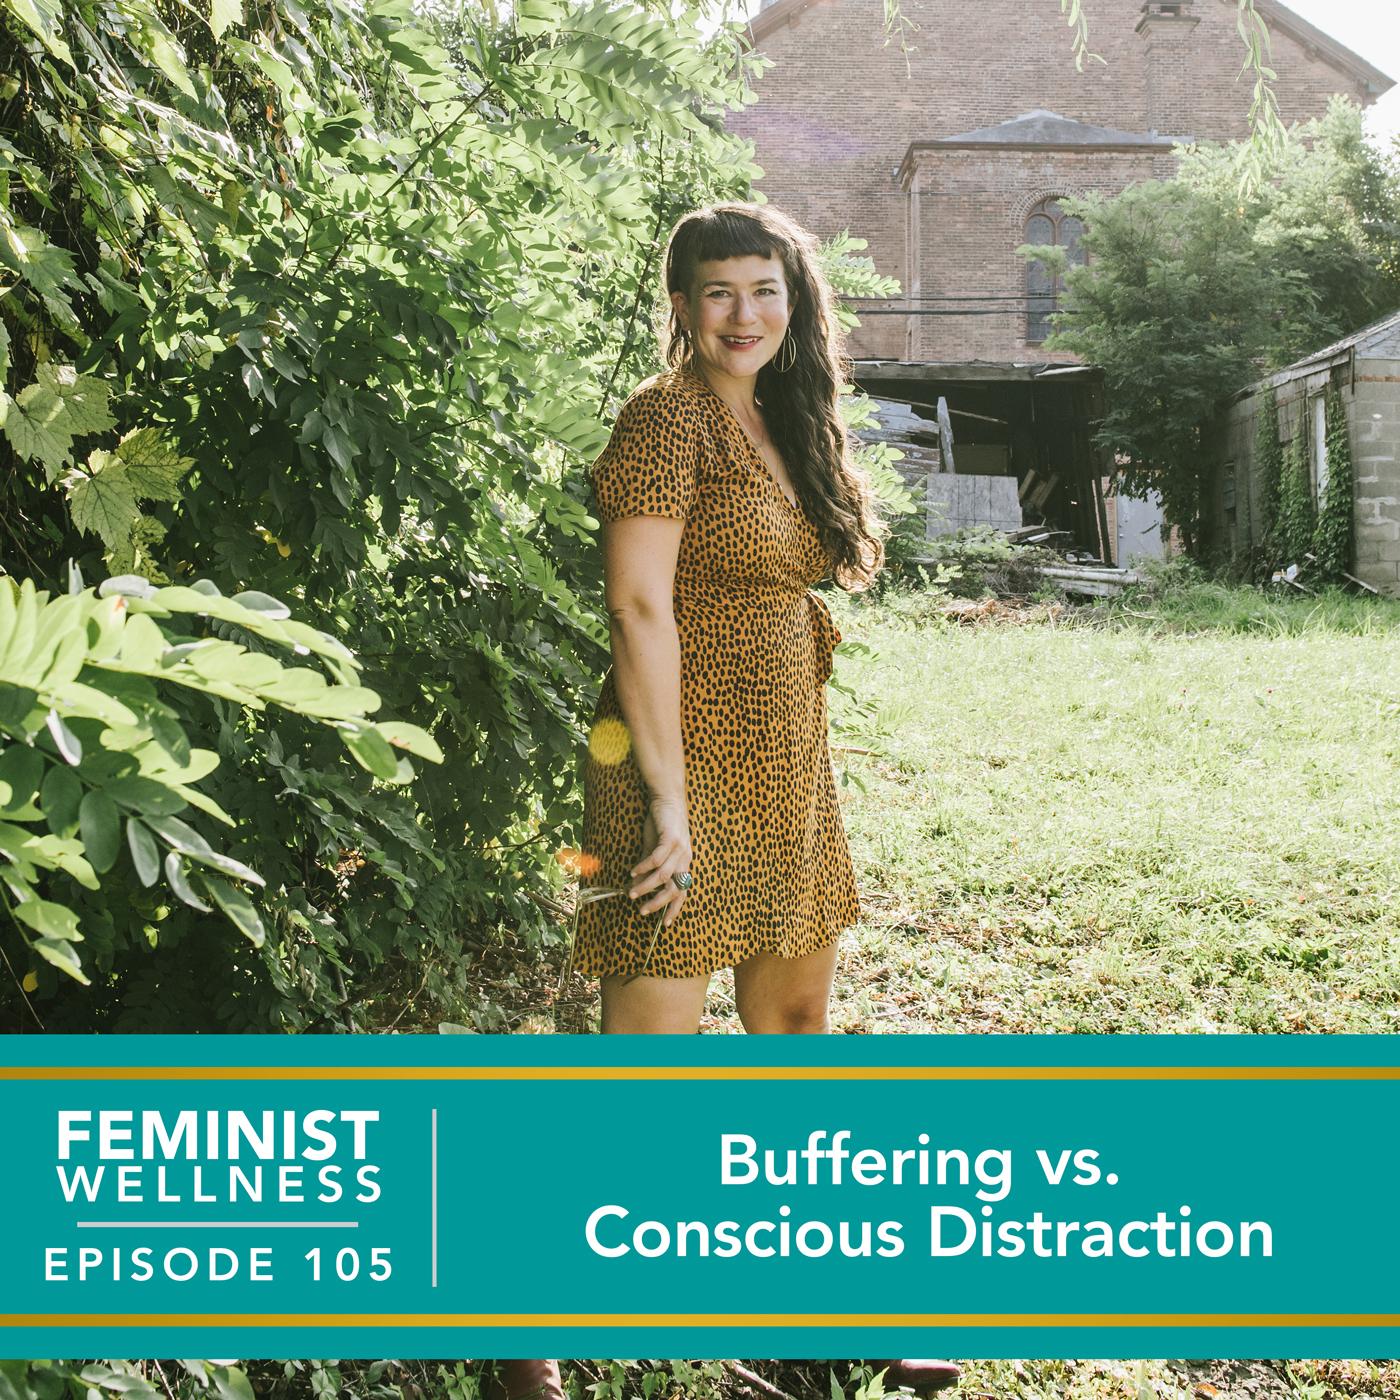 Buffering vs. Conscious Distraction